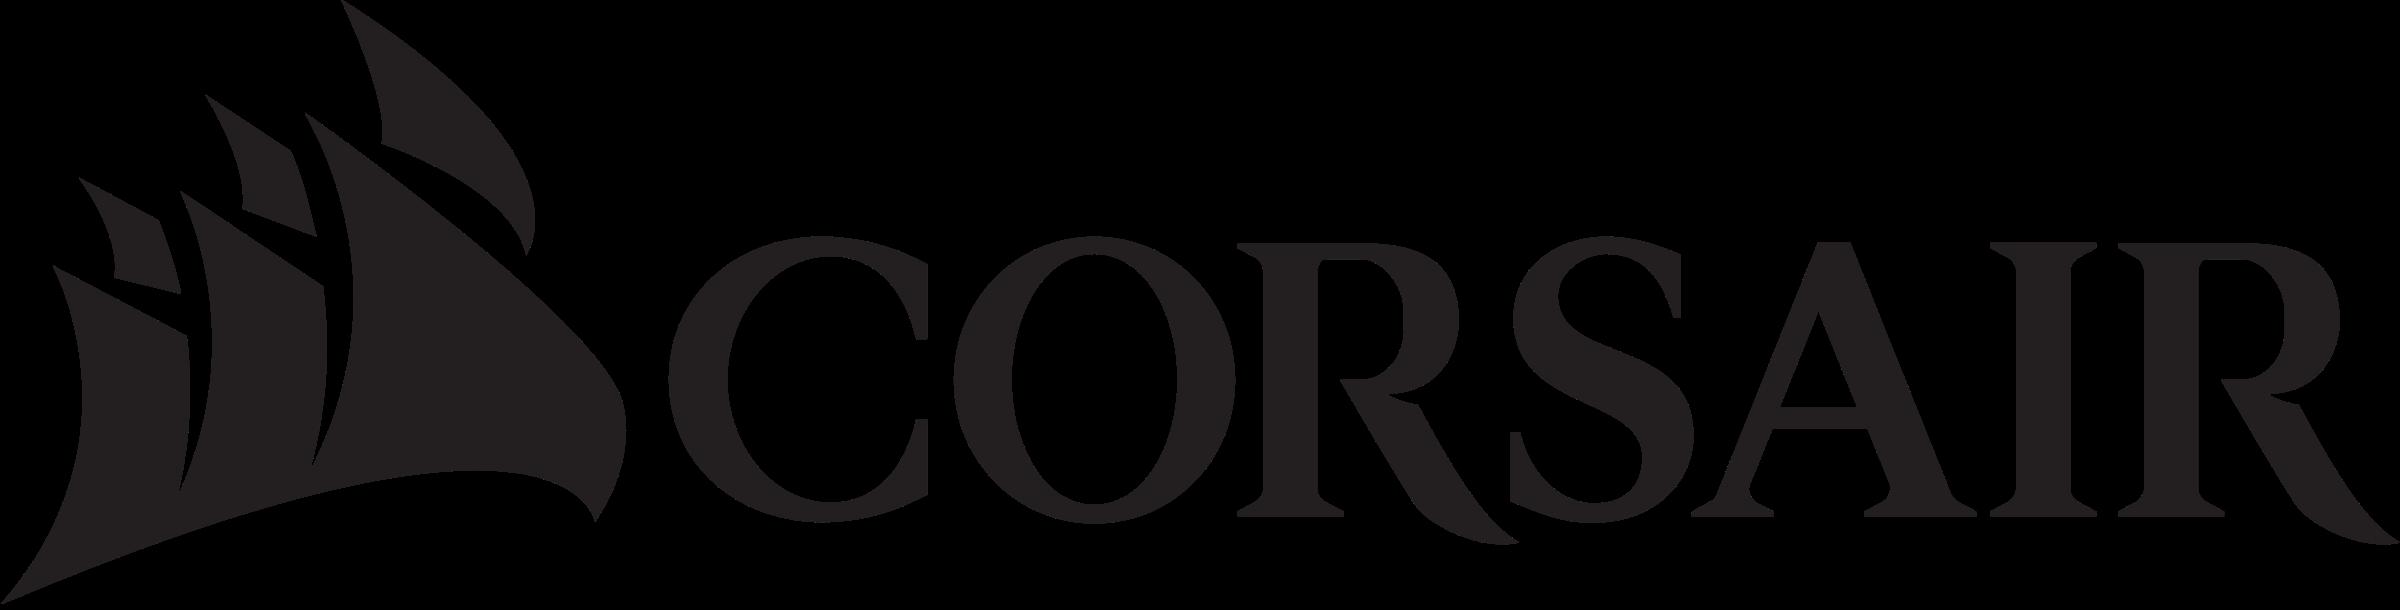 CORSAIR KEYBOARDS - Sunlit Computers